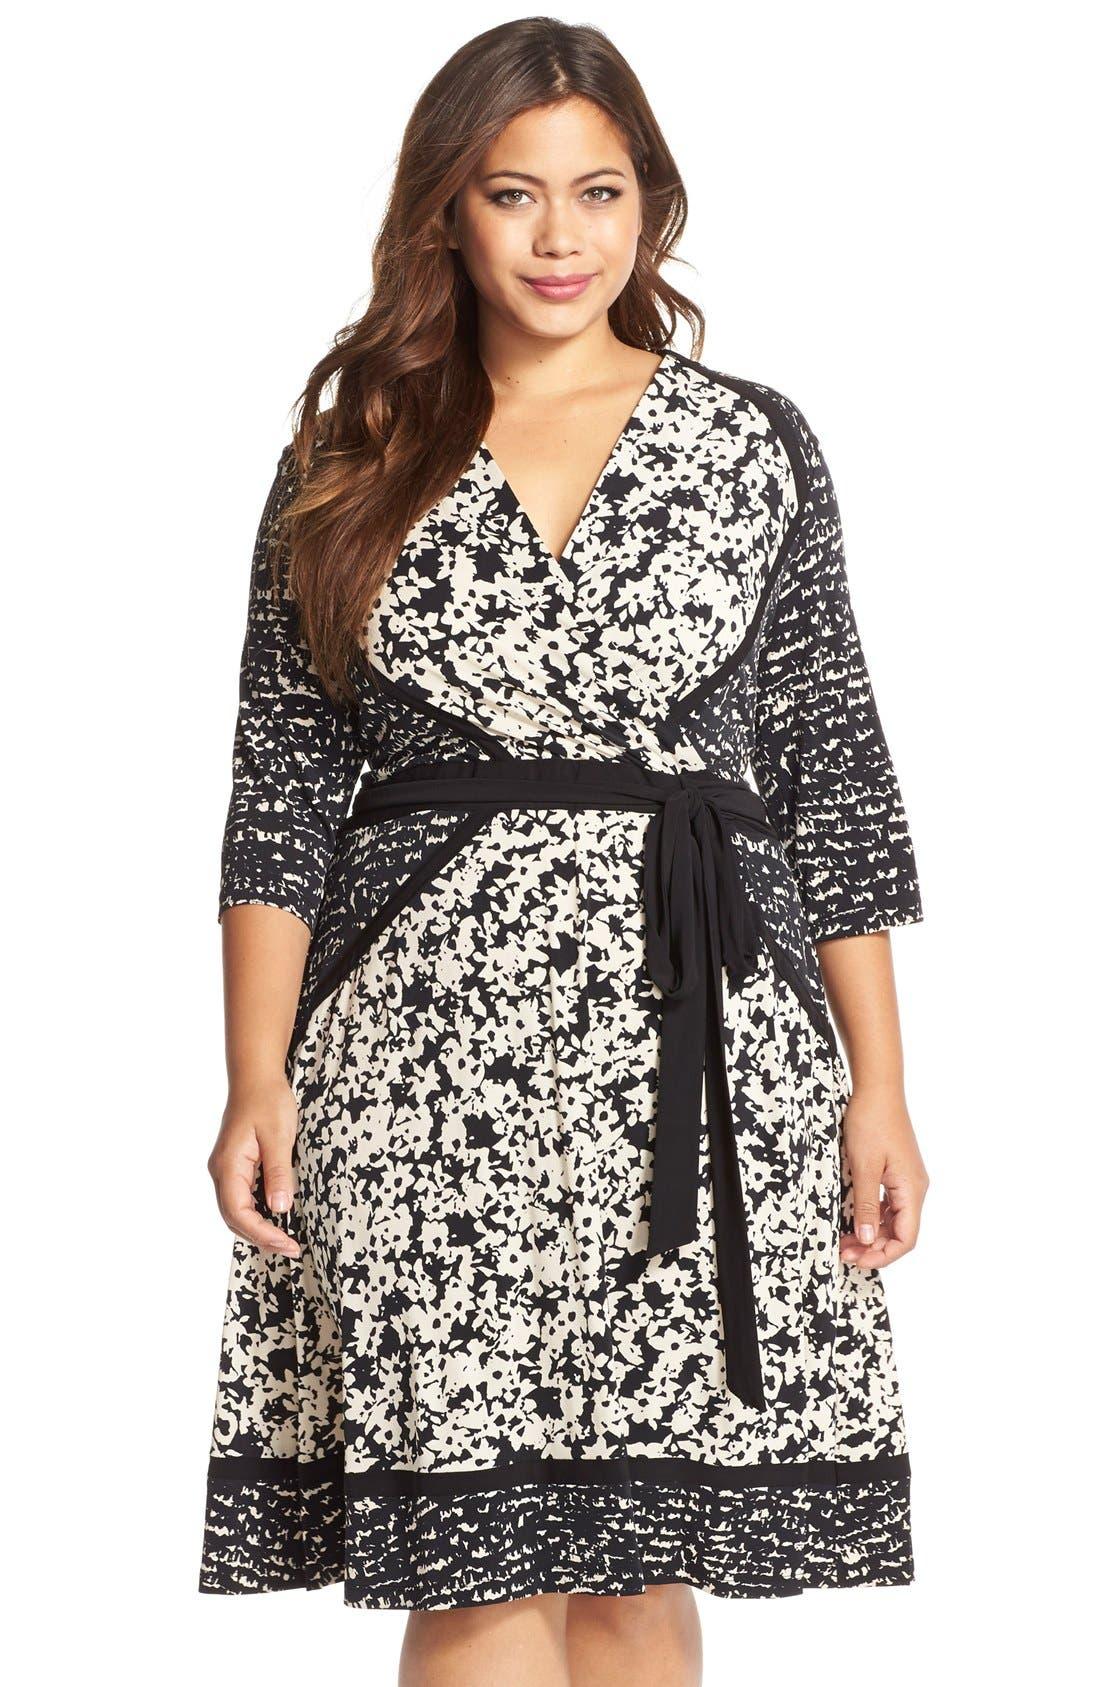 Alternate Image 1 Selected - Taylor Dresses Mix Print Faux Wrap Jersey A-Line Dress